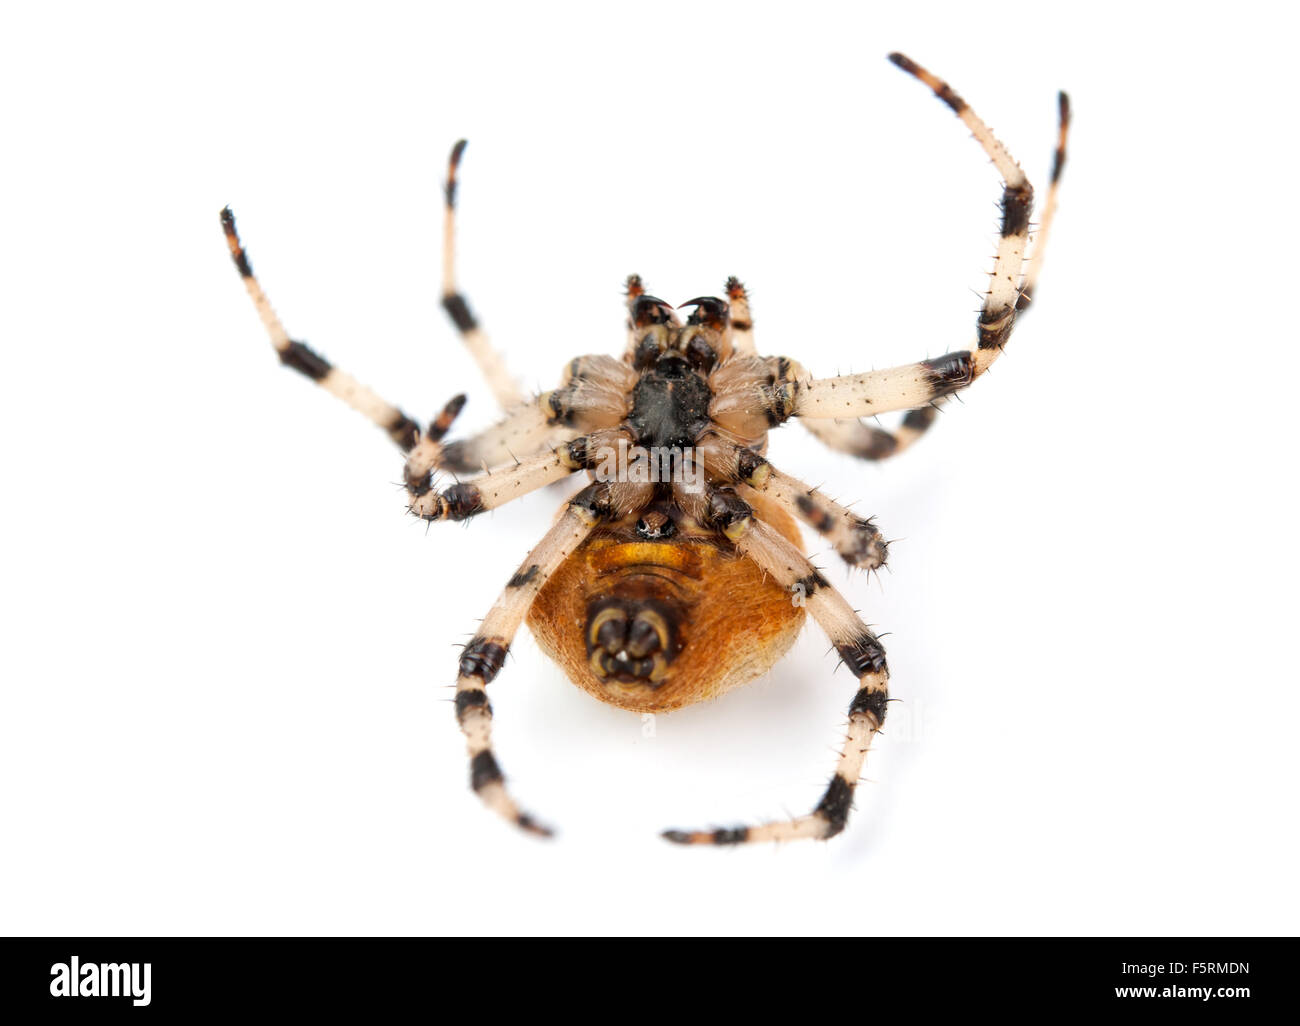 spider, Araneus diadematus, on its back against white background - Stock Image